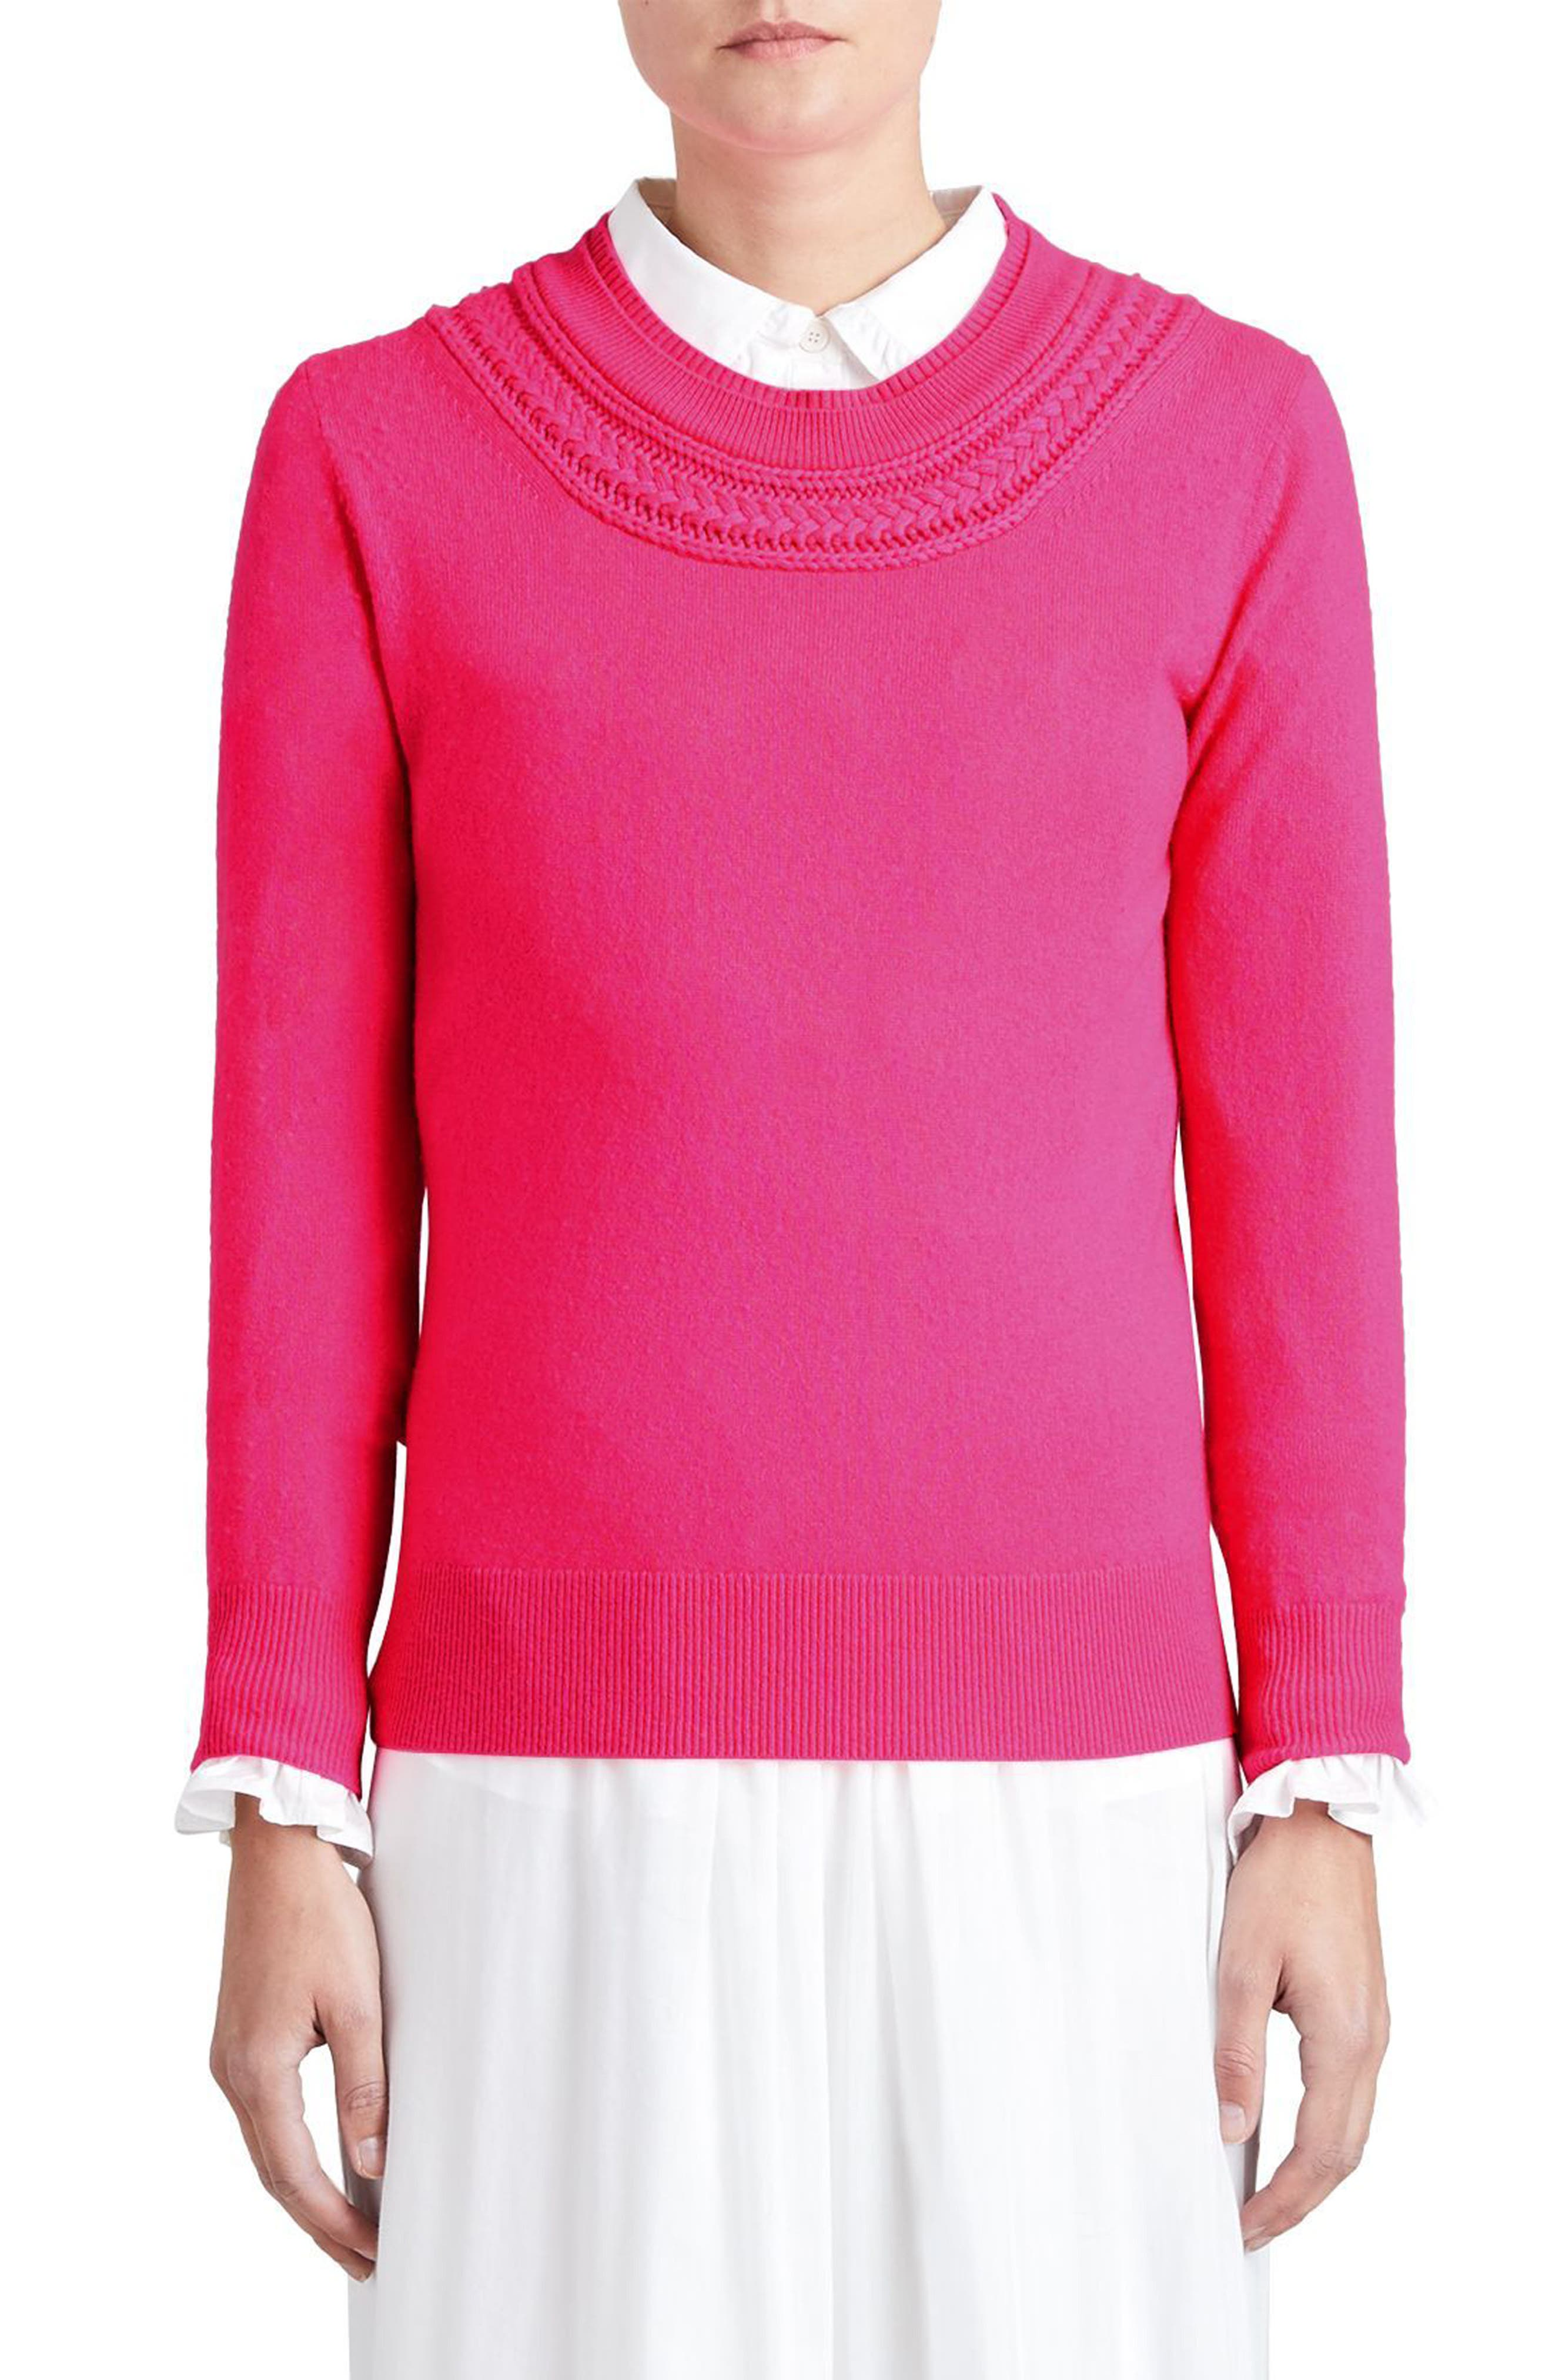 Guadaira Cashmere Sweater,                         Main,                         color, Bright Rose Pink